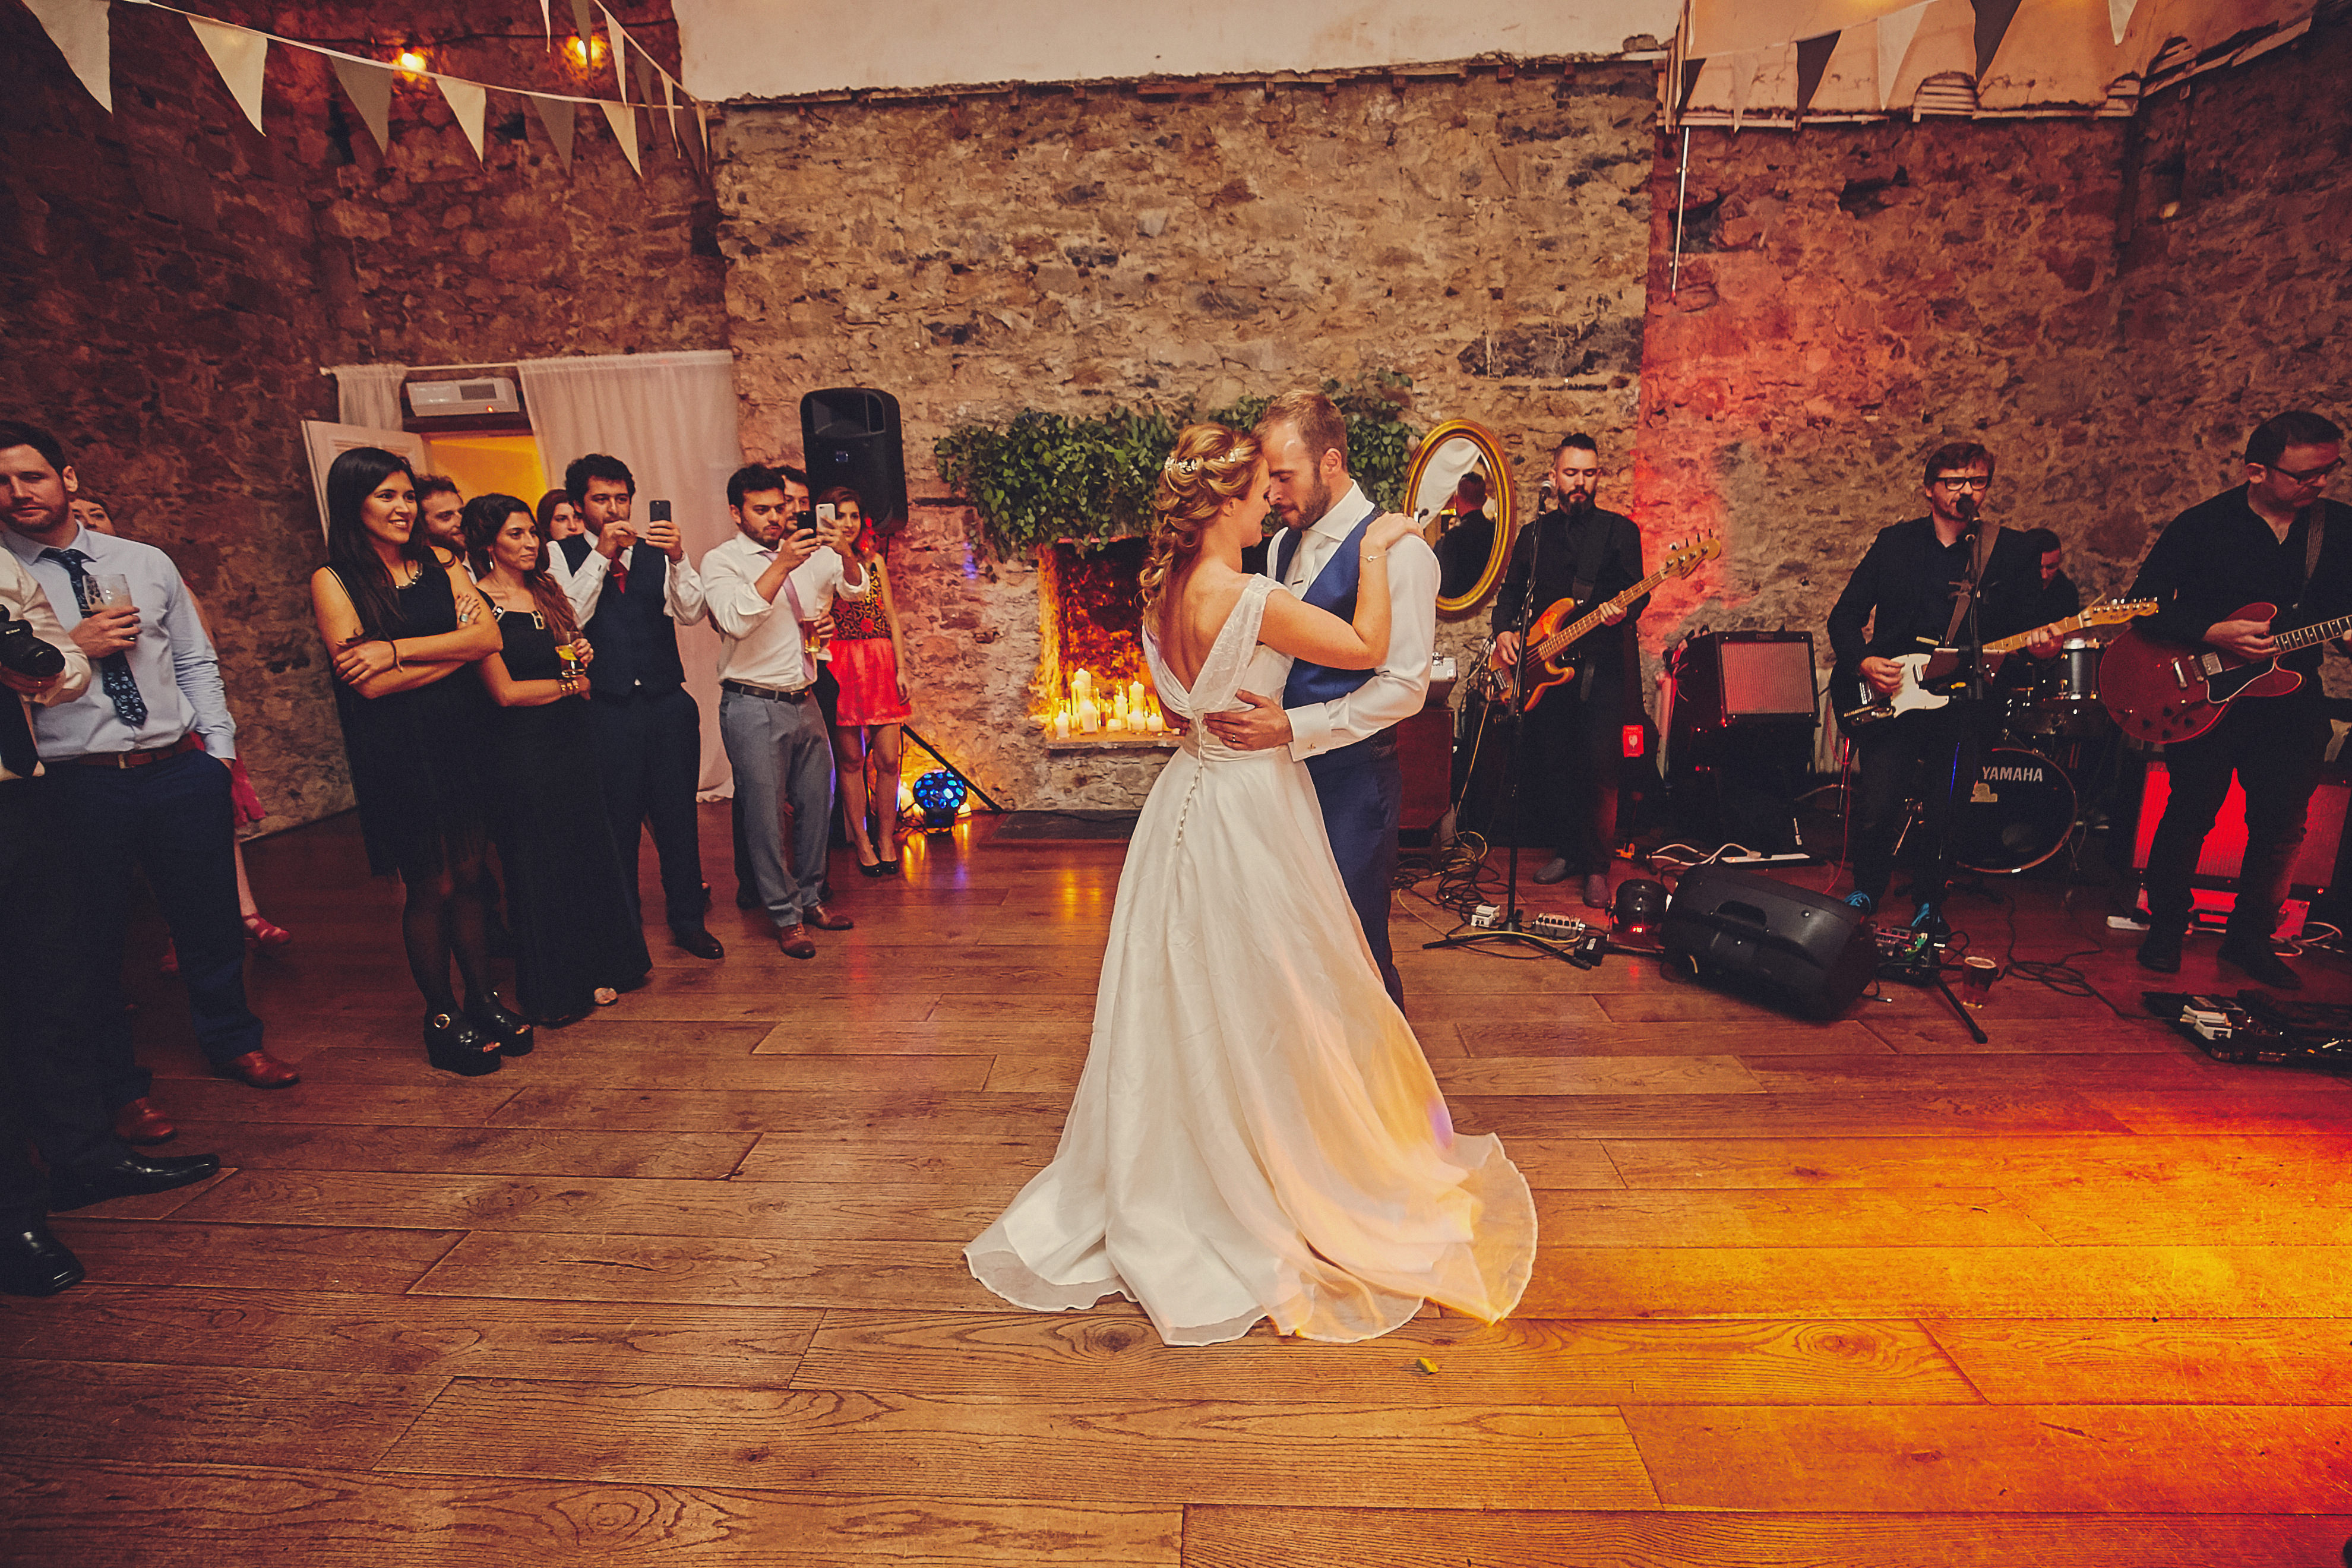 Cloughjordan House weddding158 - Cloughjordan House Wedding - Alternative Venue